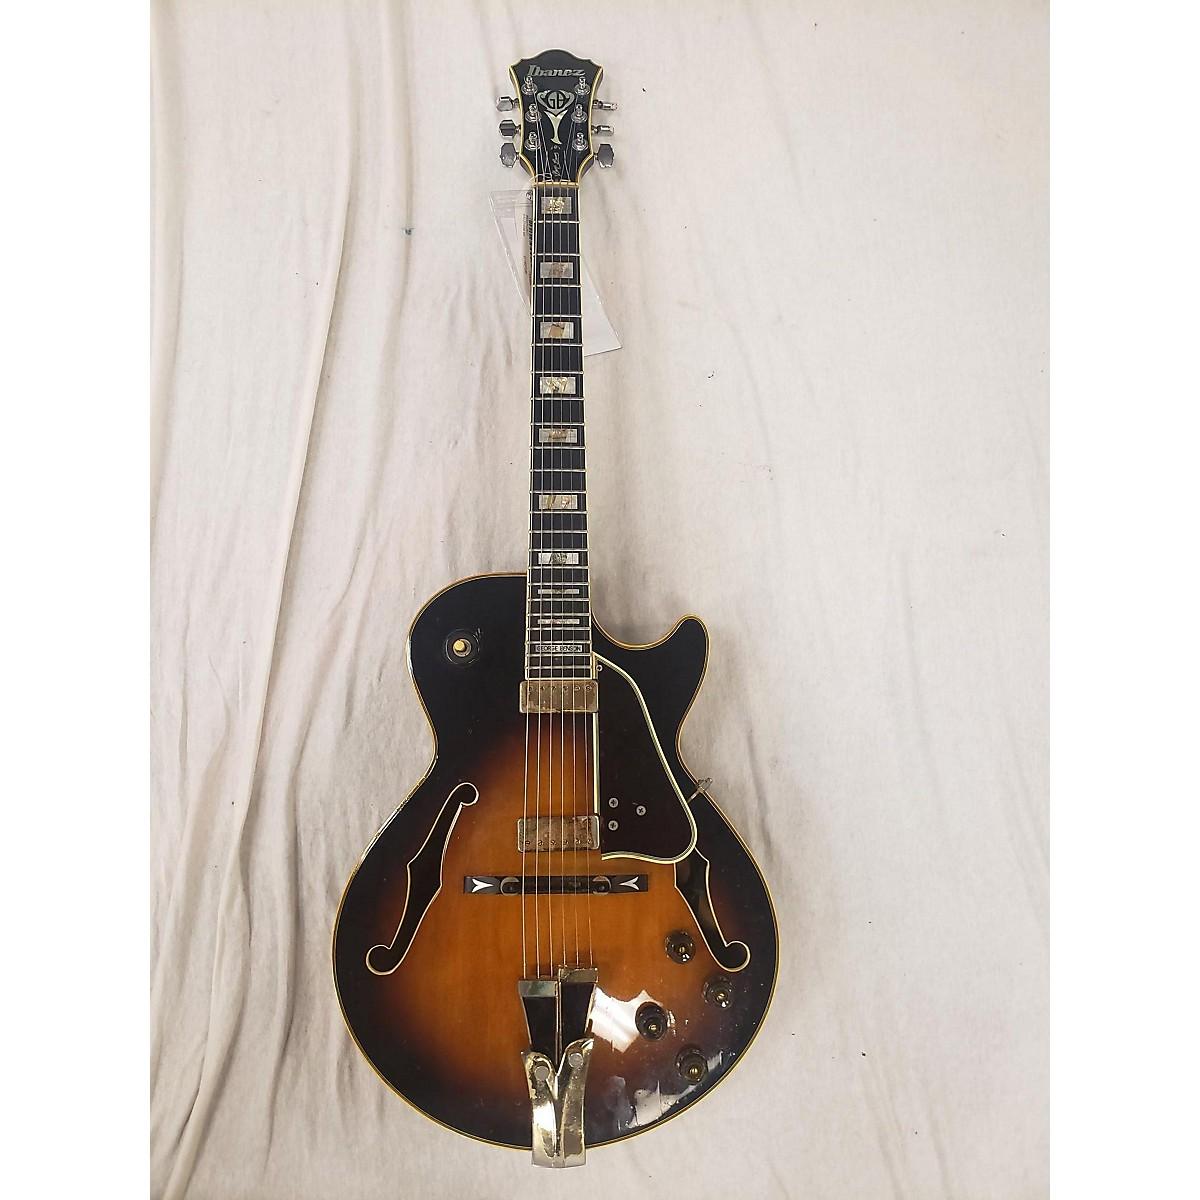 Ibanez 1985 Gb10 GEORGE BENSON SIGNATURE Hollow Body Electric Guitar